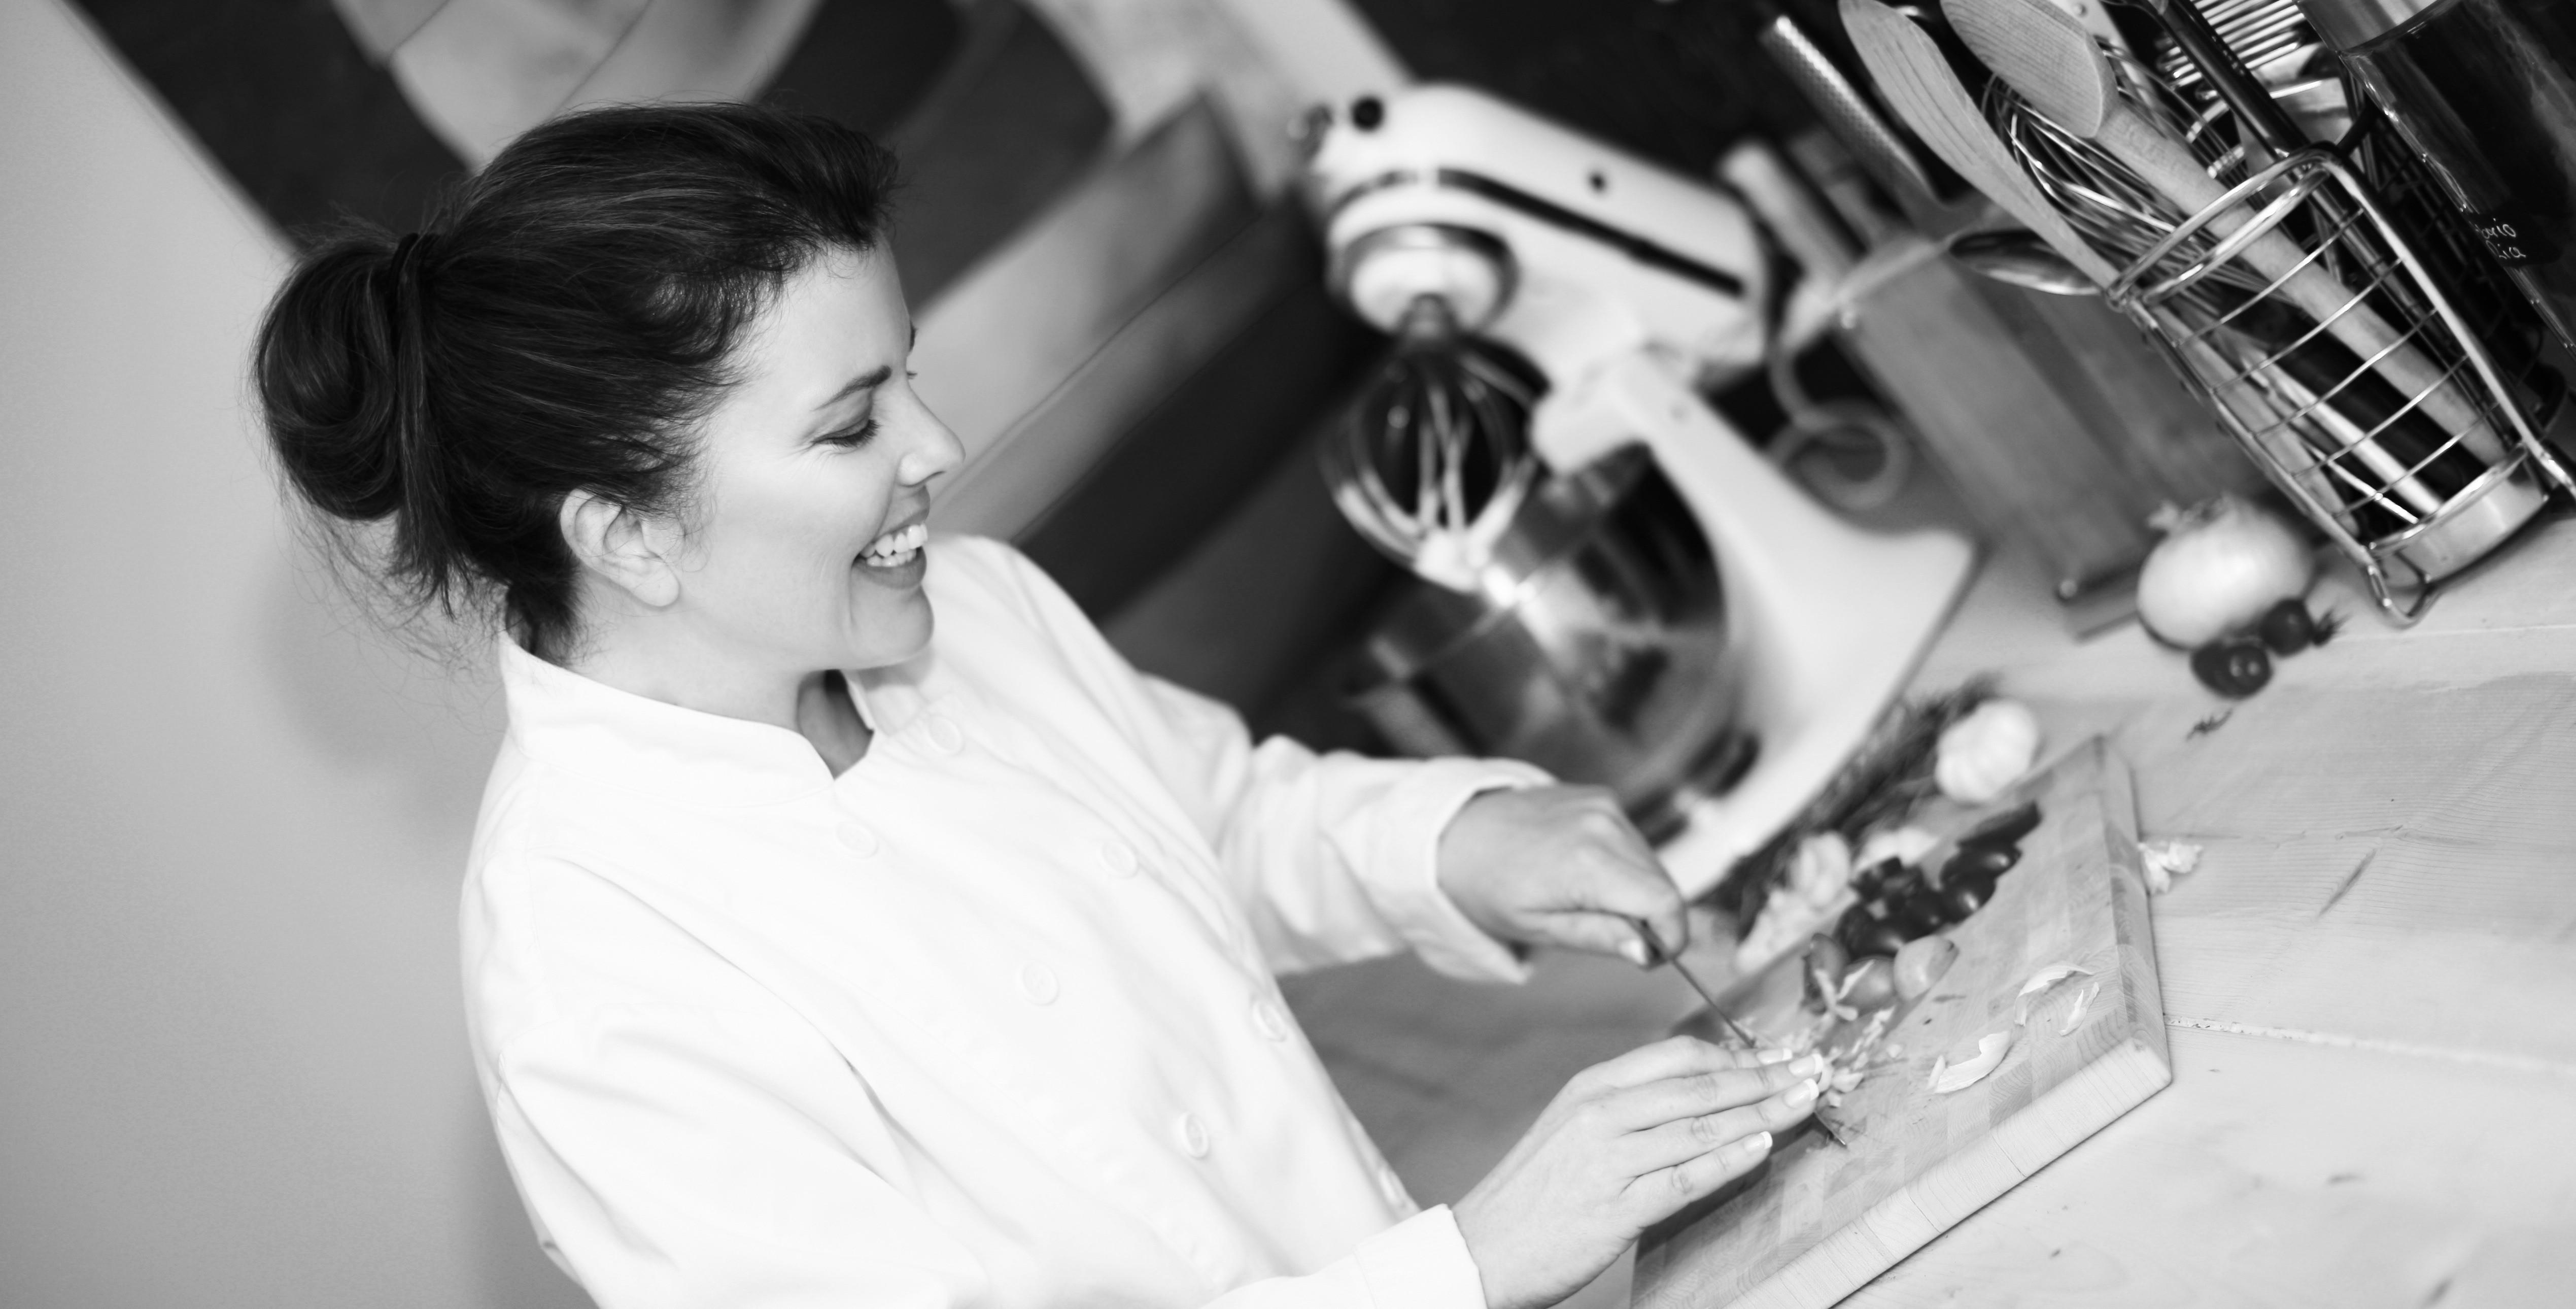 Laura MacLeod, butter lover and baker